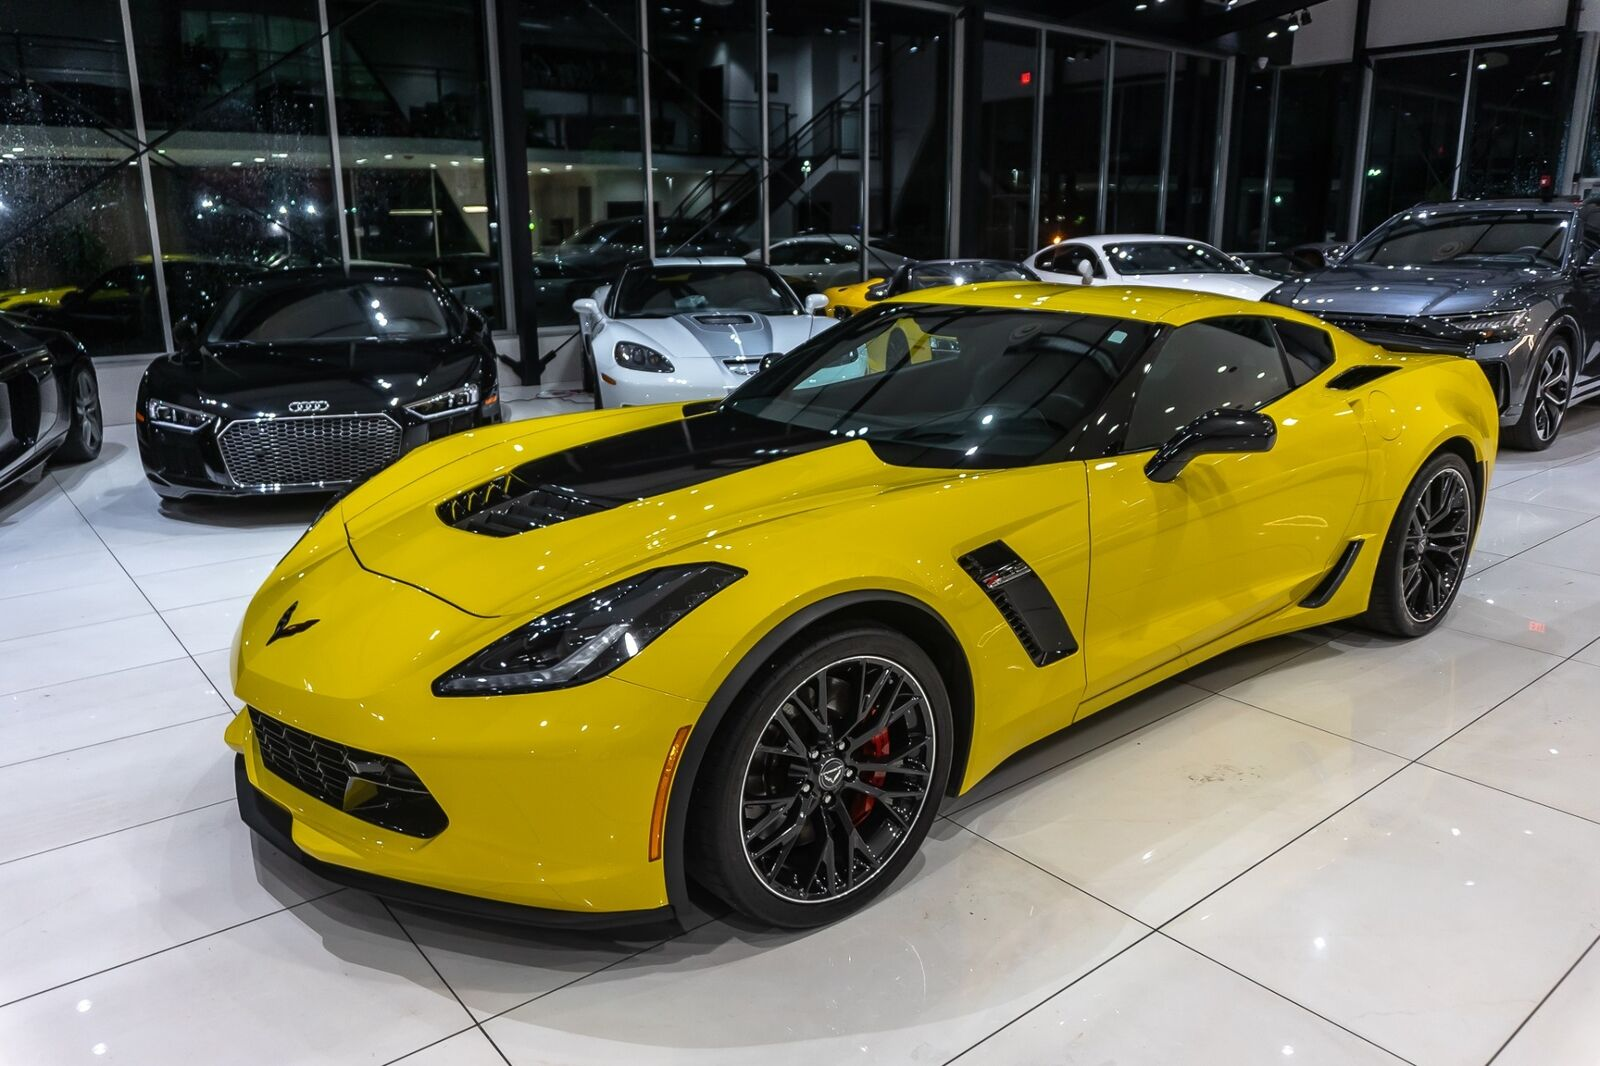 2016 Yellow Chevrolet Corvette Coupe 2LZ   C7 Corvette Photo 10